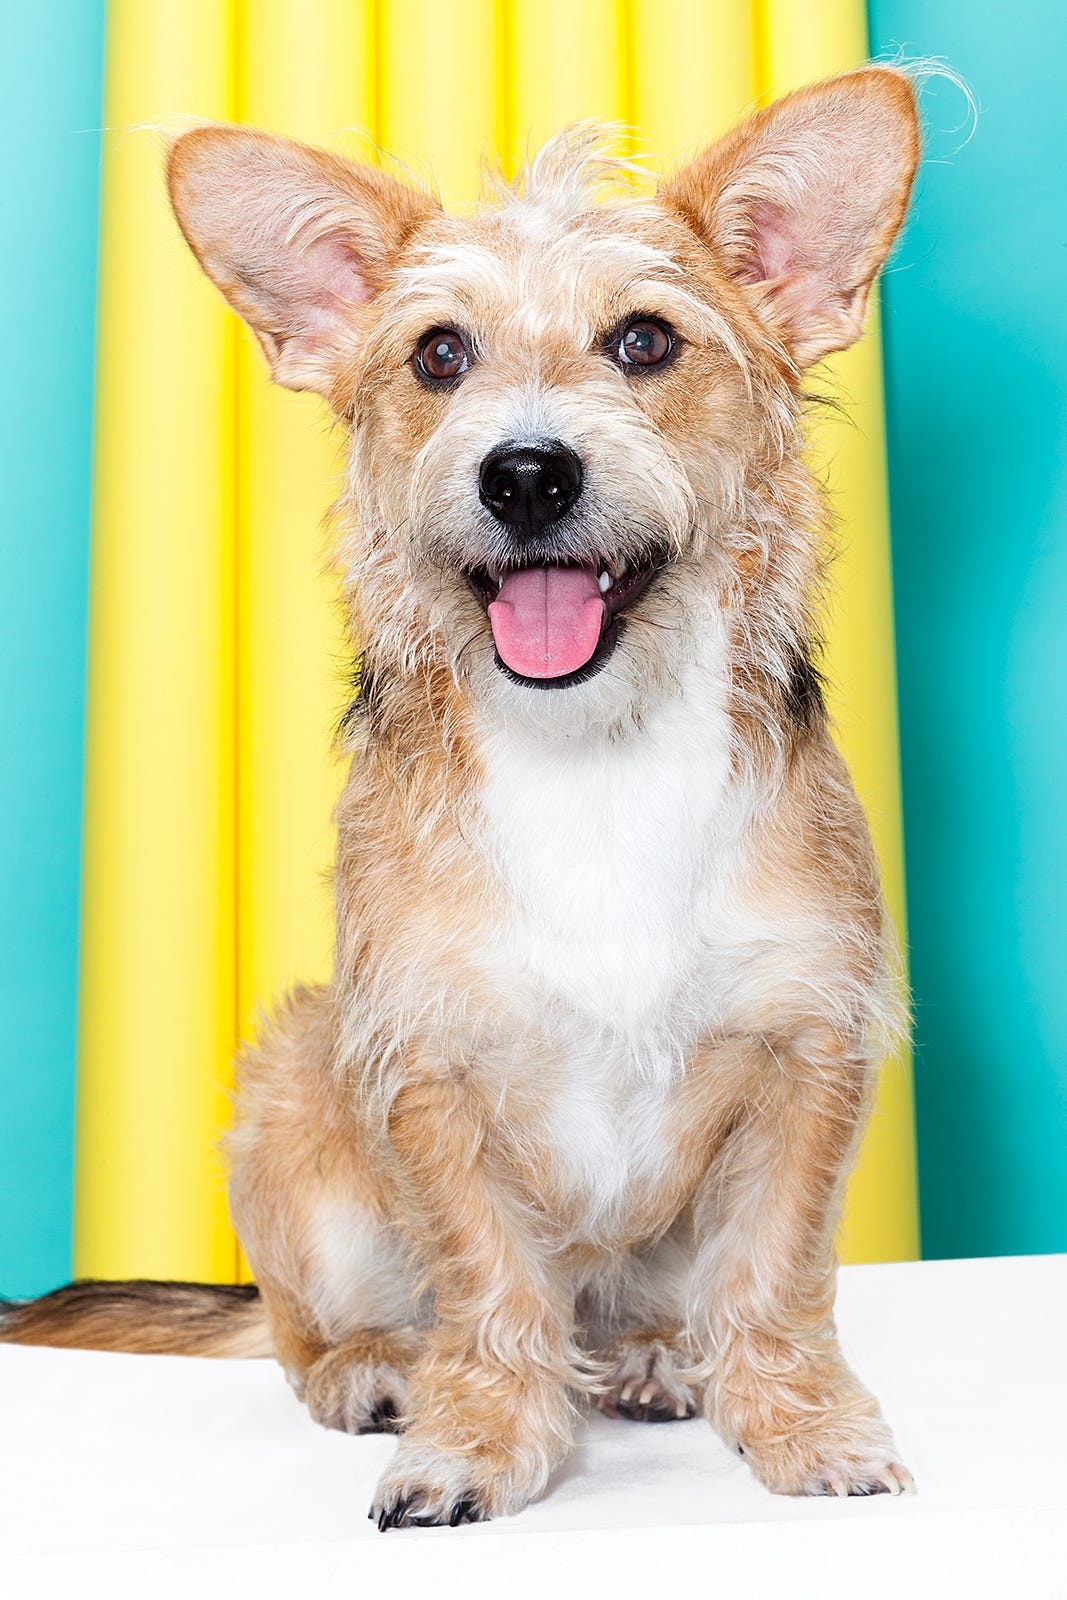 Cute Dog Pictures Pet Adoption Rescue Animals